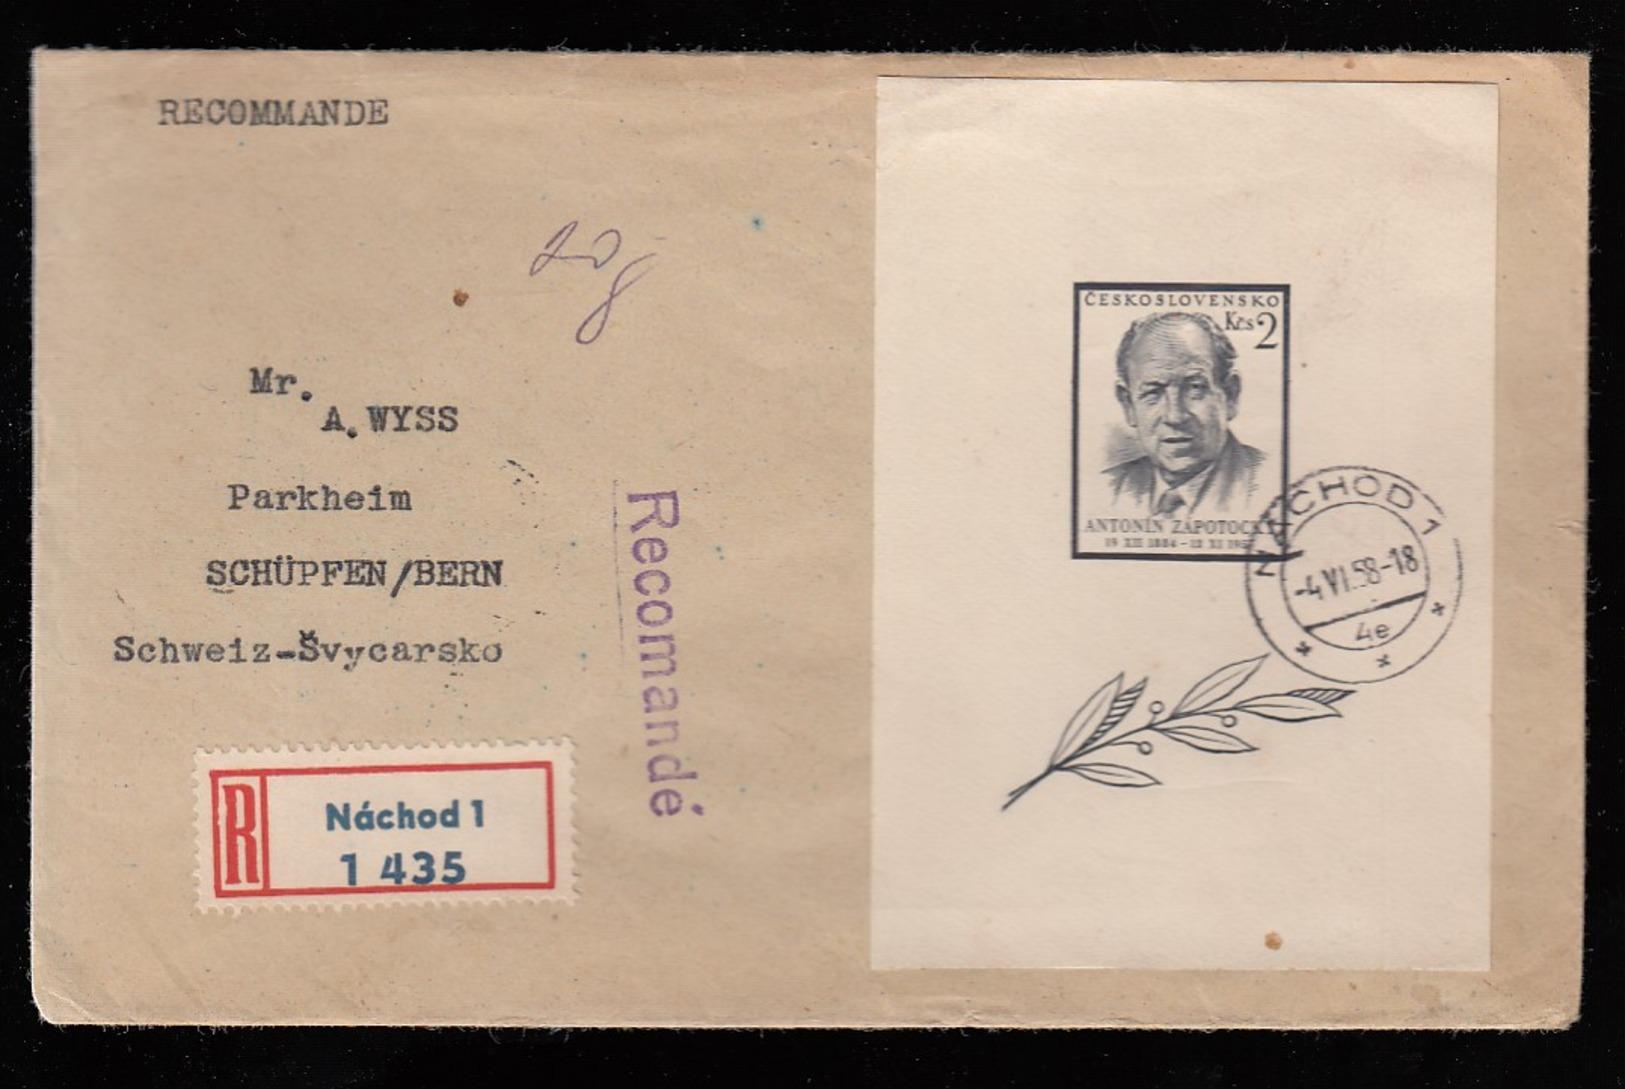 CESKOSLOVENSKO * CZECHOSLOVAKIA * CZECH * REGISTERED COVER WITH BLOCK ANTONIN ZAPOTOCKY 1958 - Tsjechoslowakije